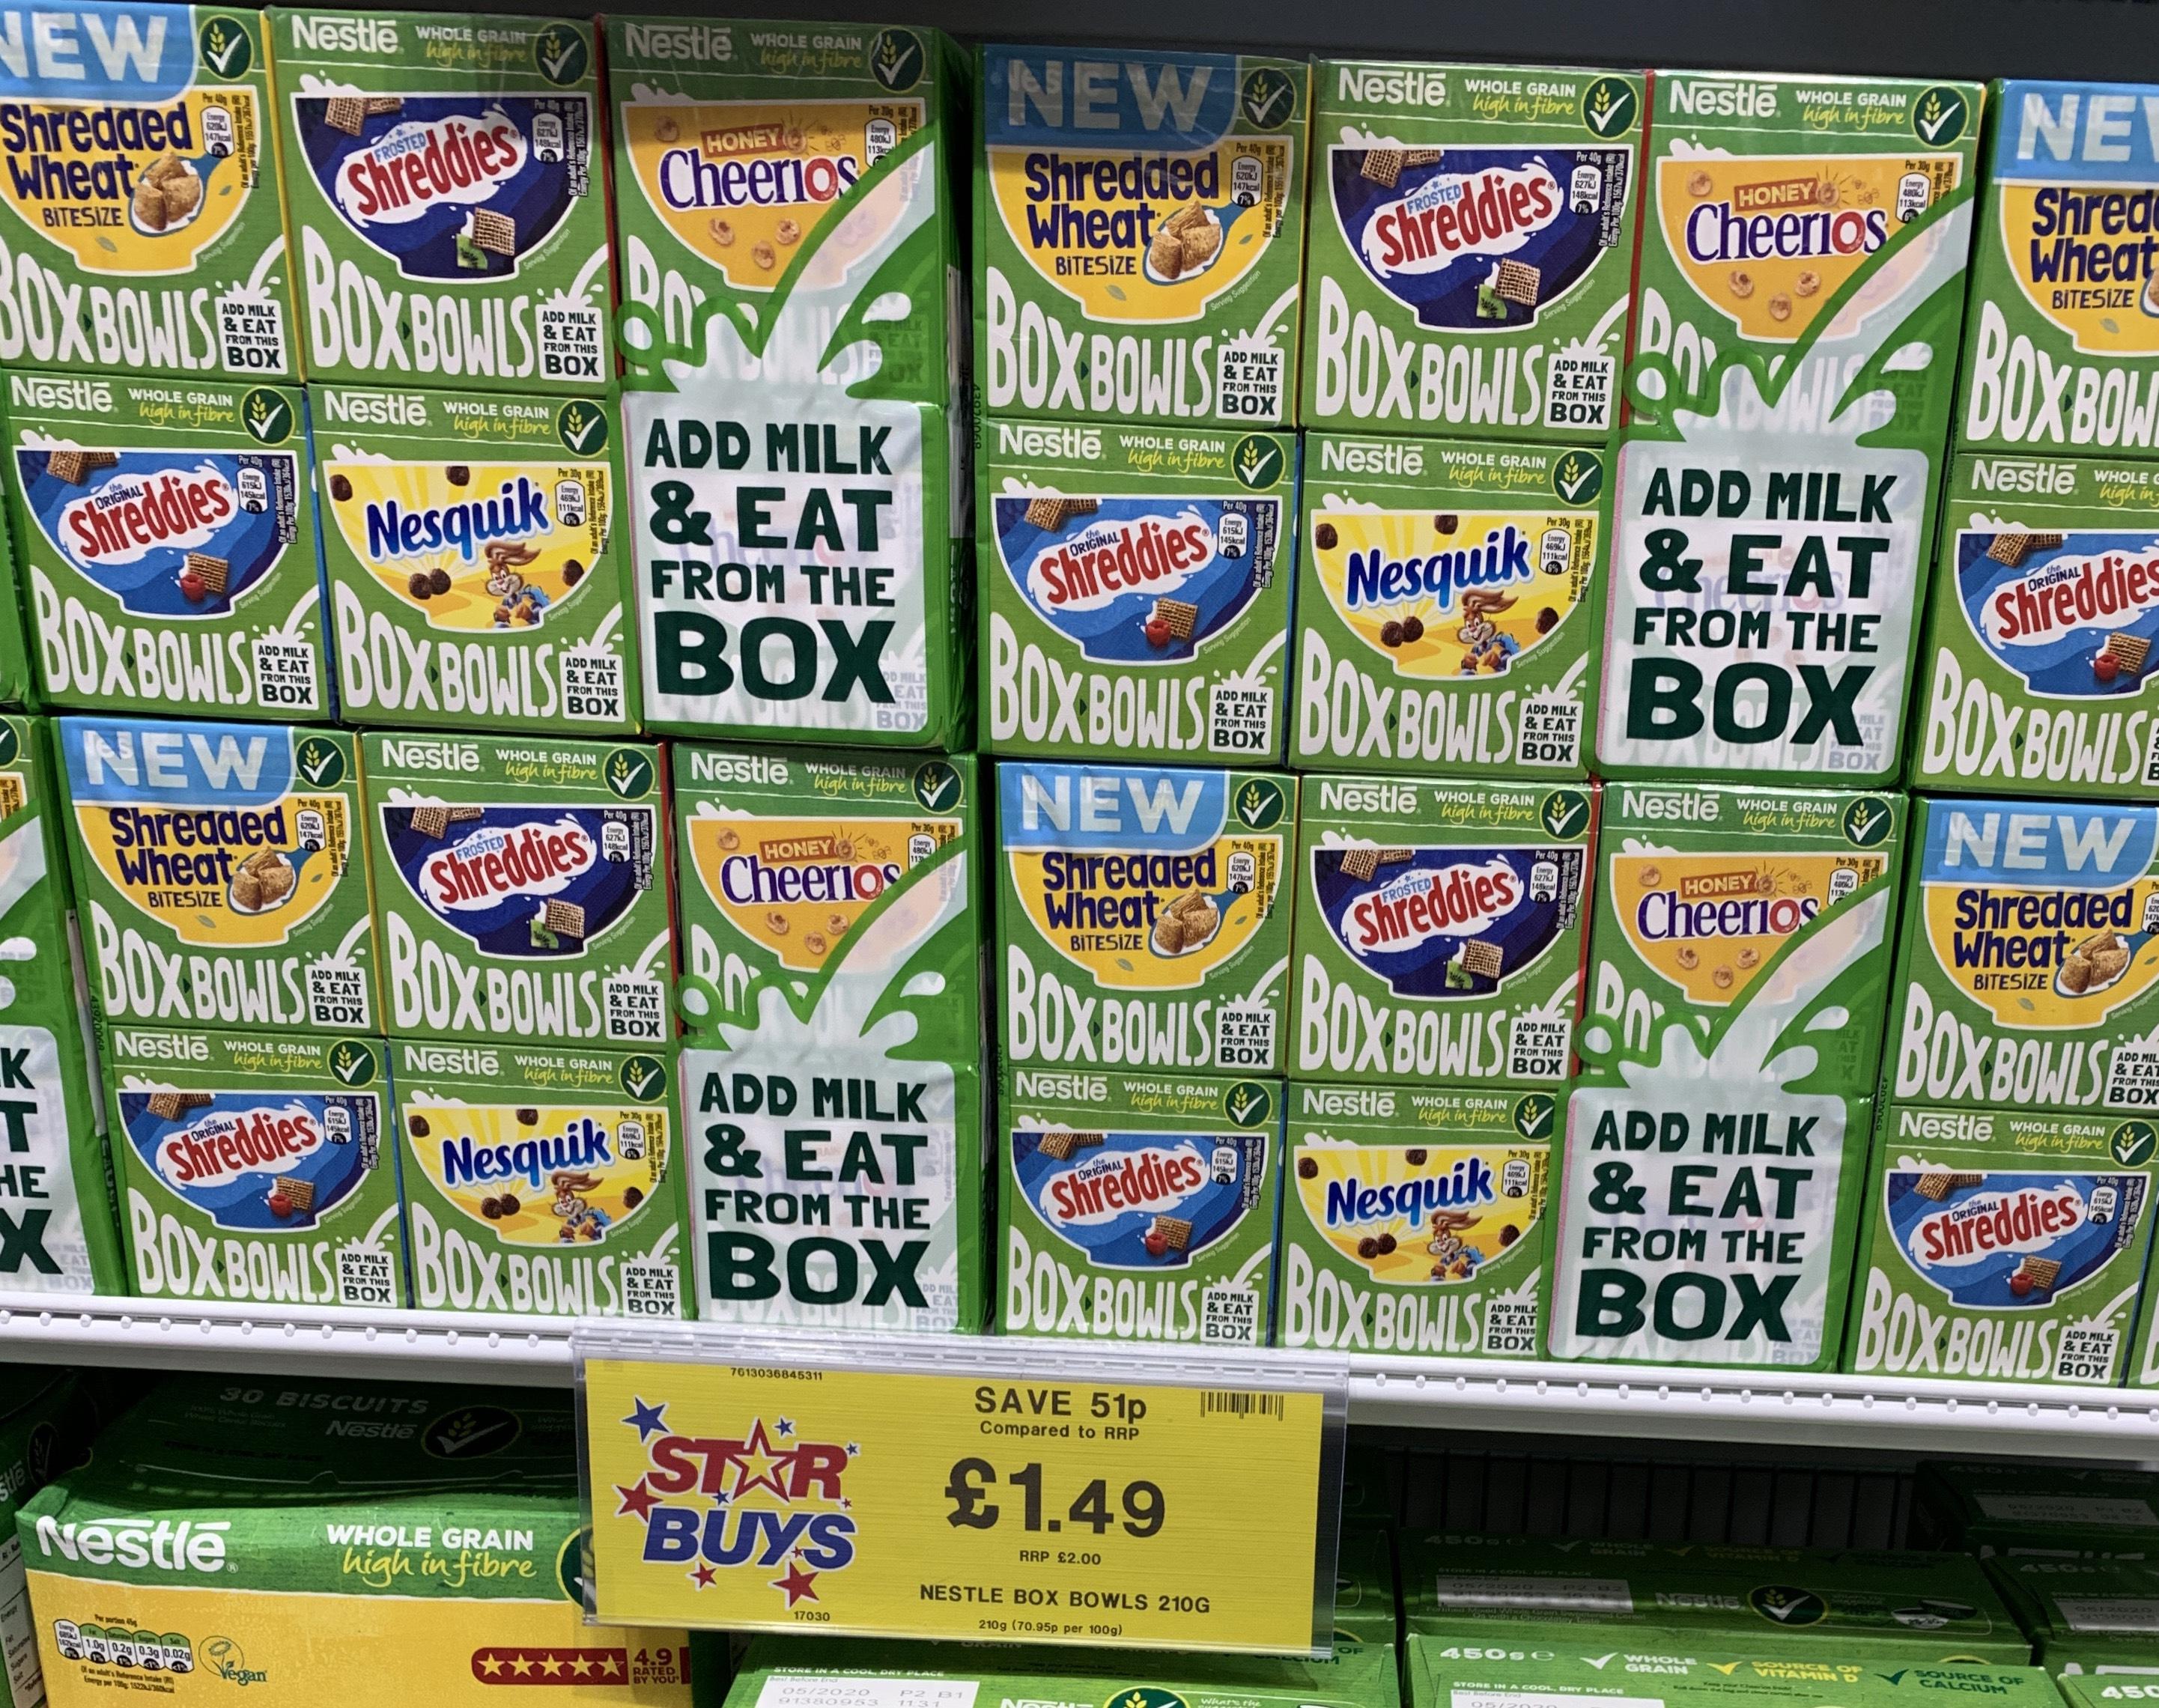 Nestle Box Bowls £1.49 instore - Home Bargains